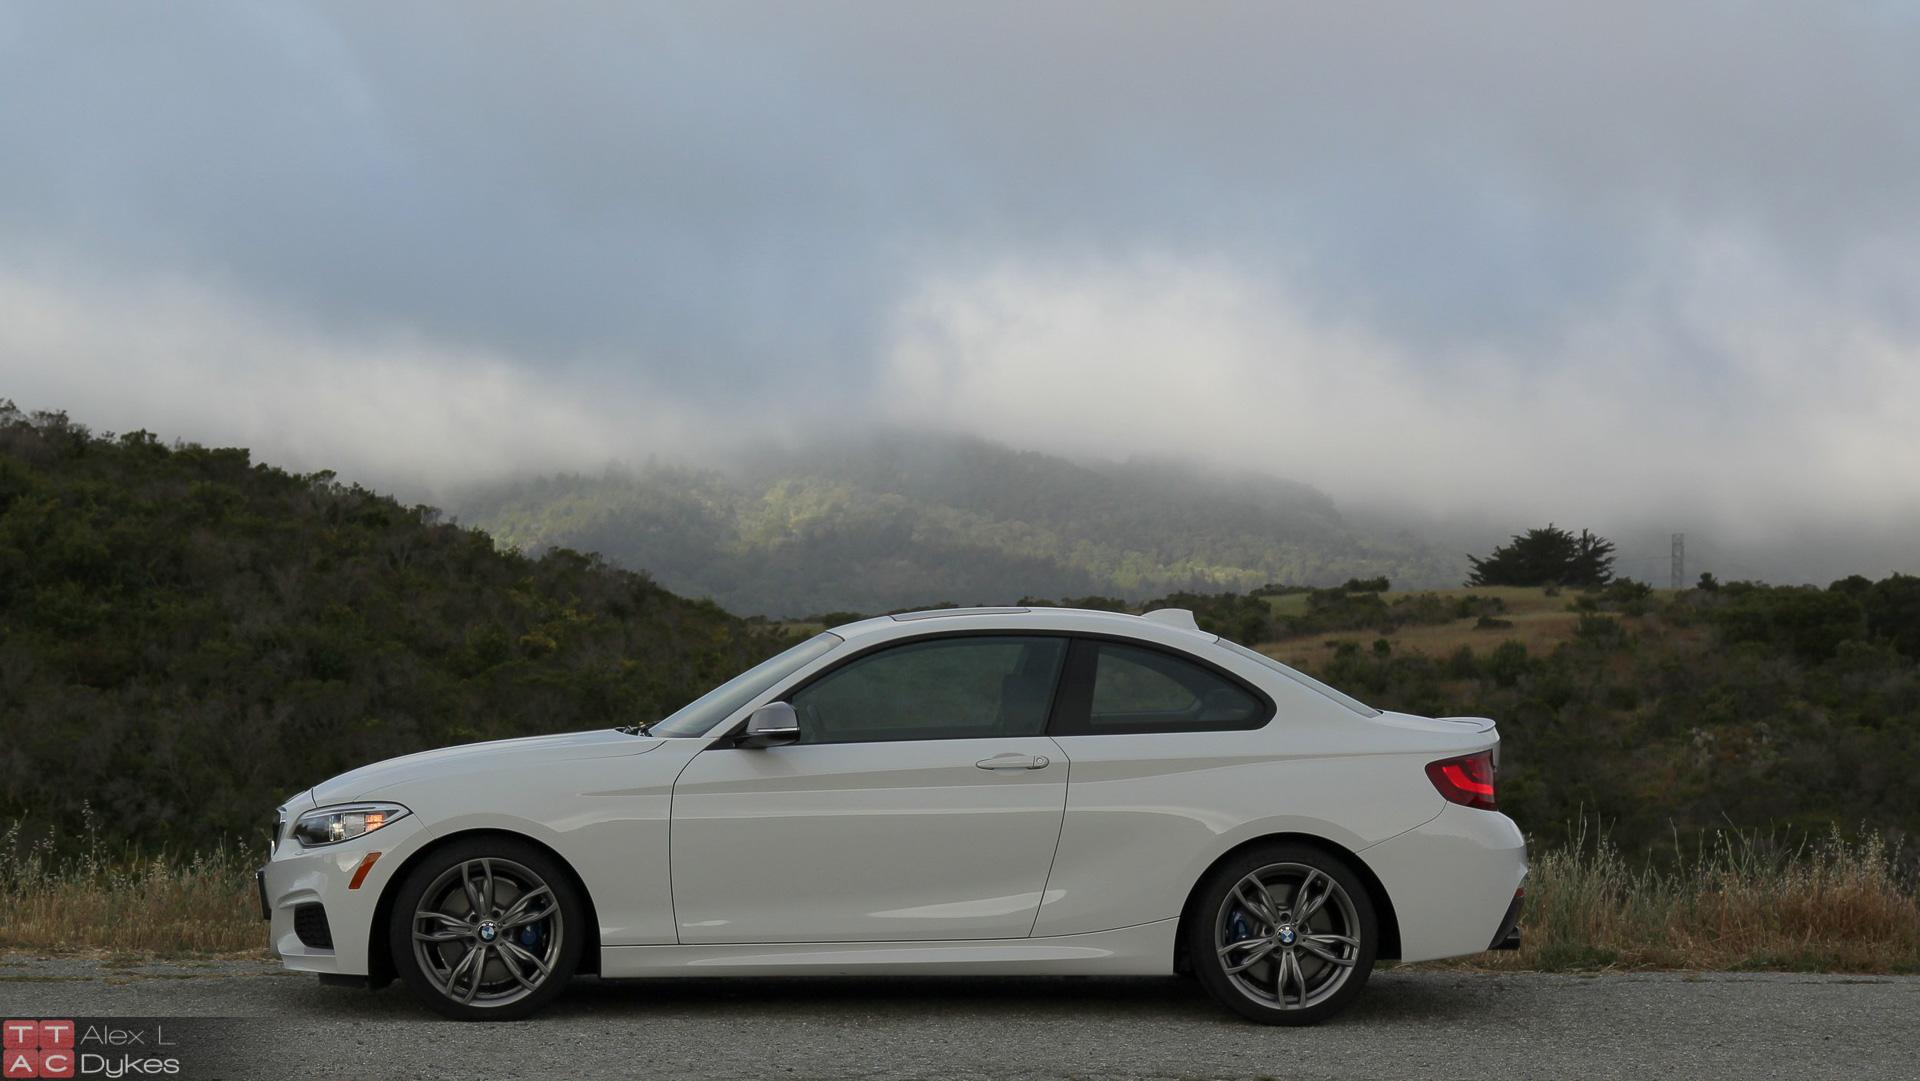 2015 BMW M235i High Resolution Wallpaper 1920x1081